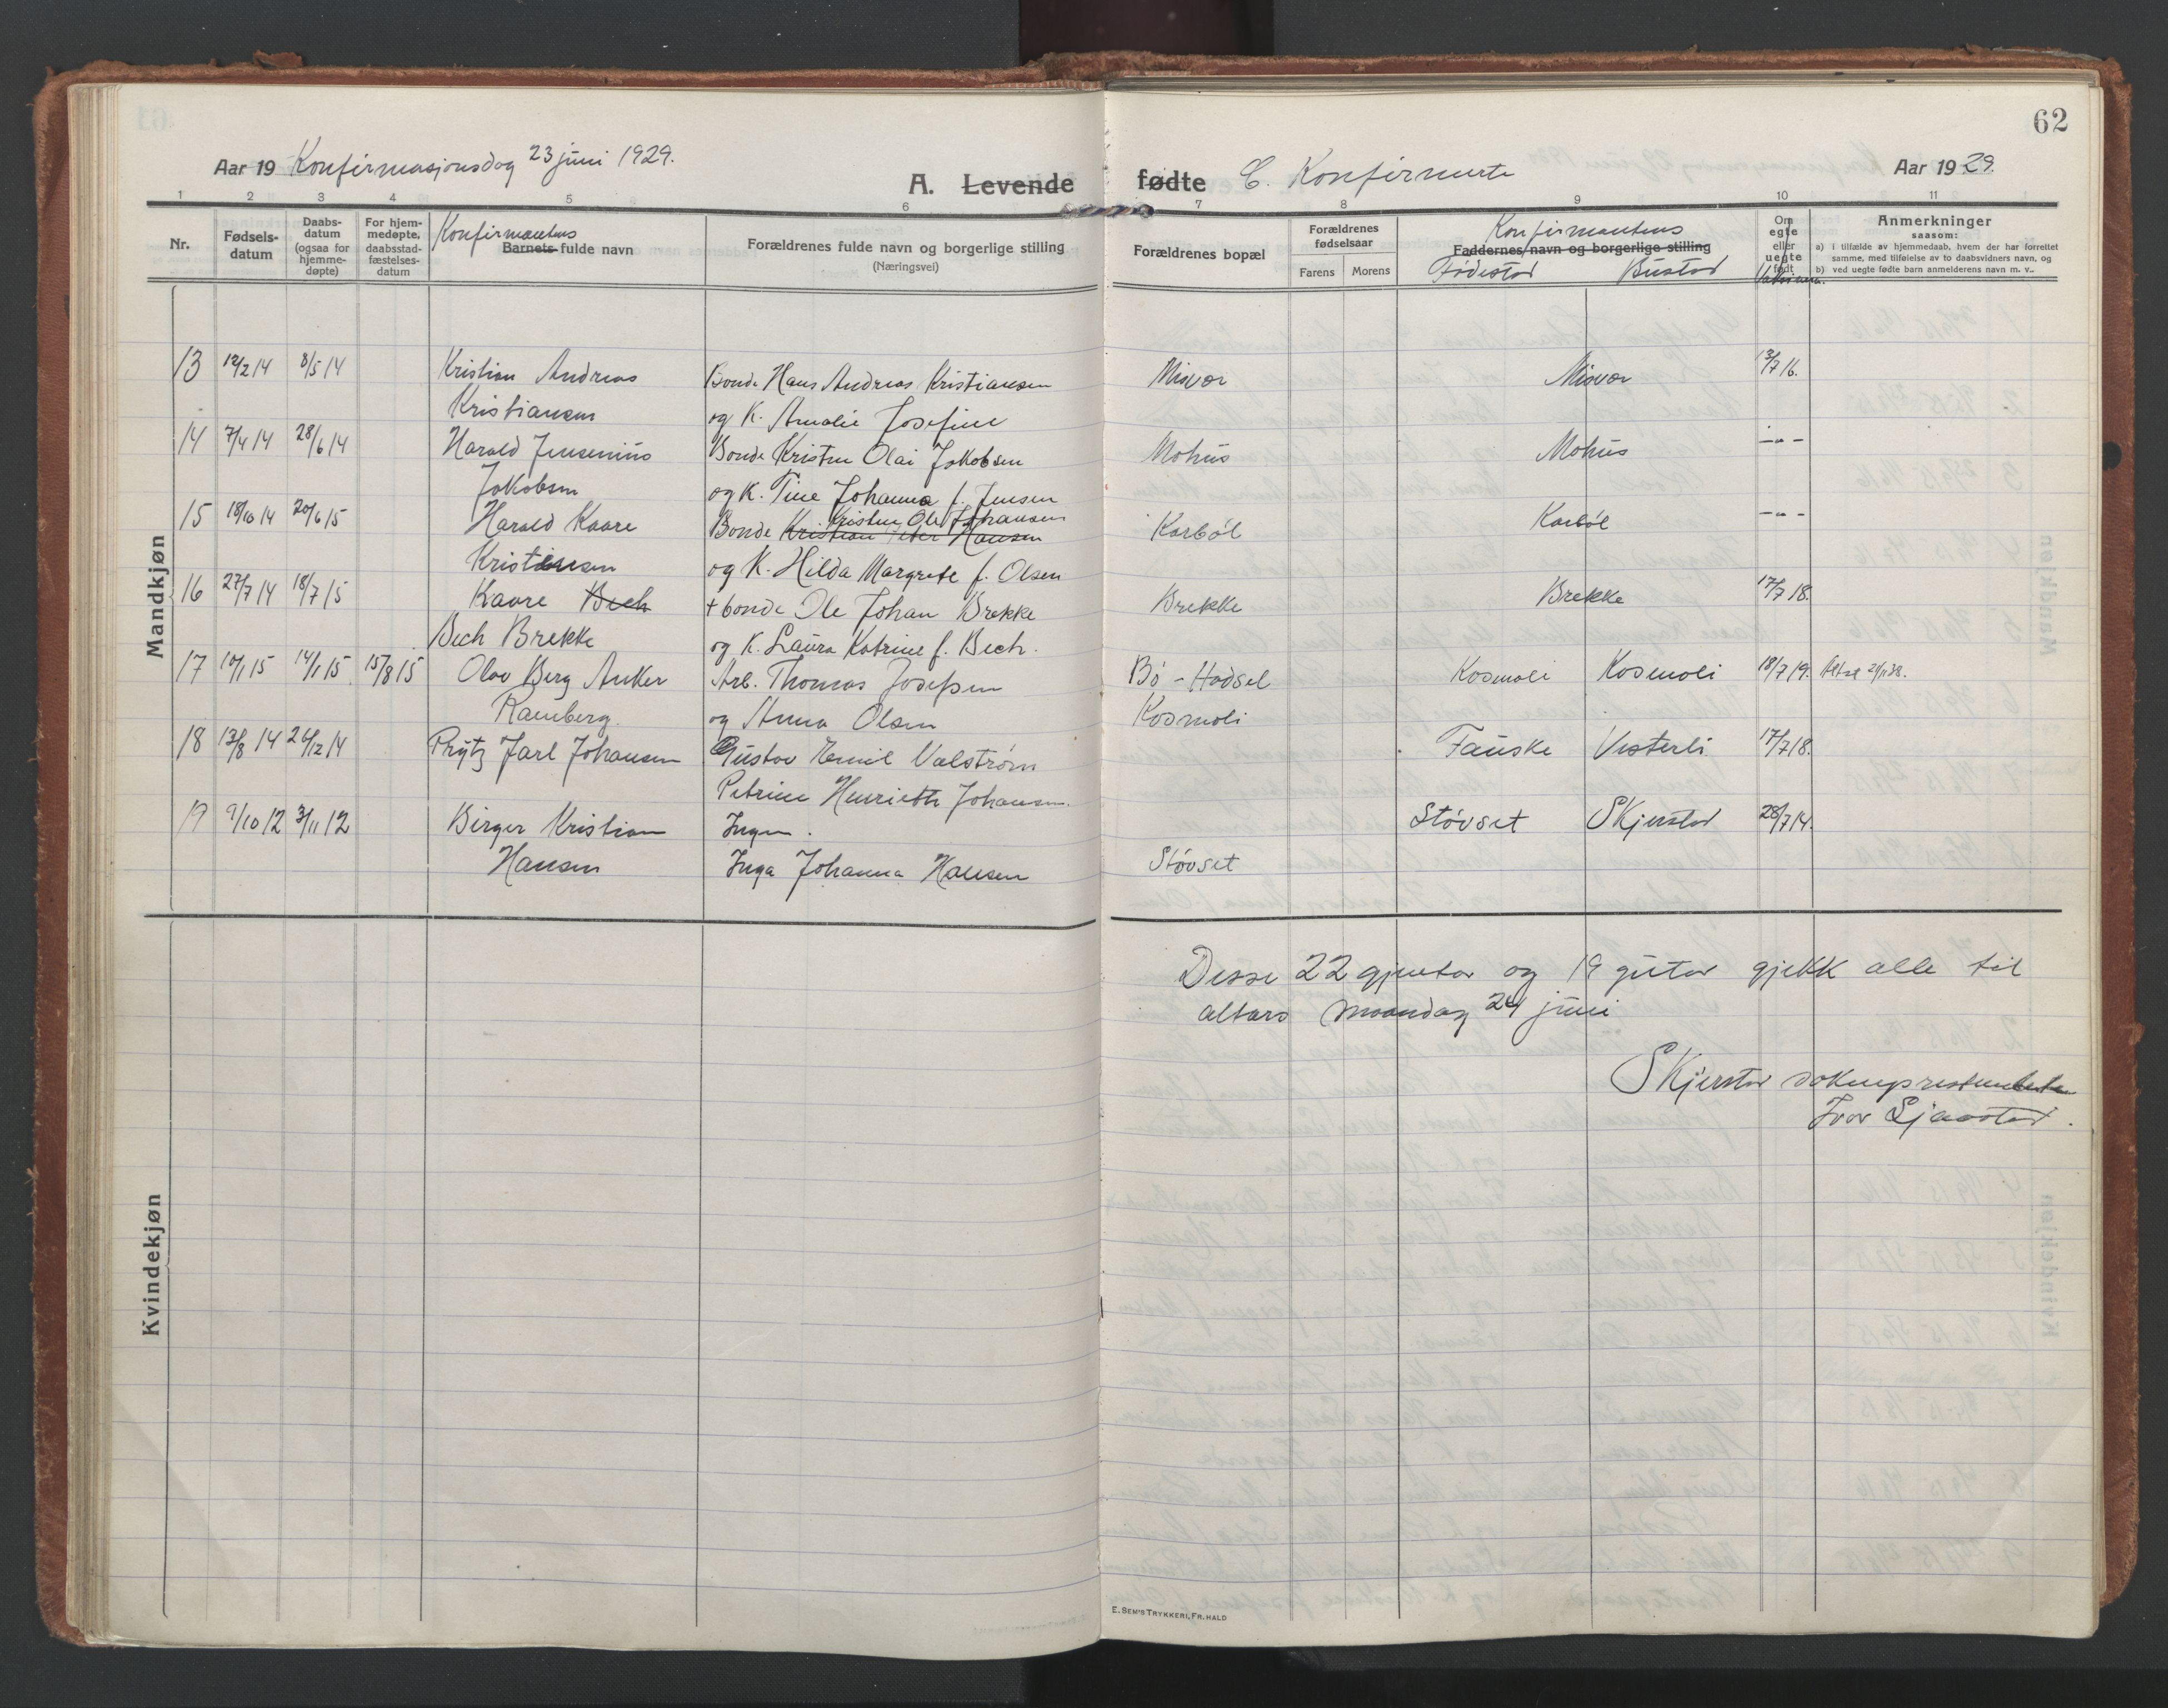 SAT, Ministerialprotokoller, klokkerbøker og fødselsregistre - Nordland, 852/L0748: Ministerialbok nr. 852A18, 1913-1932, s. 62